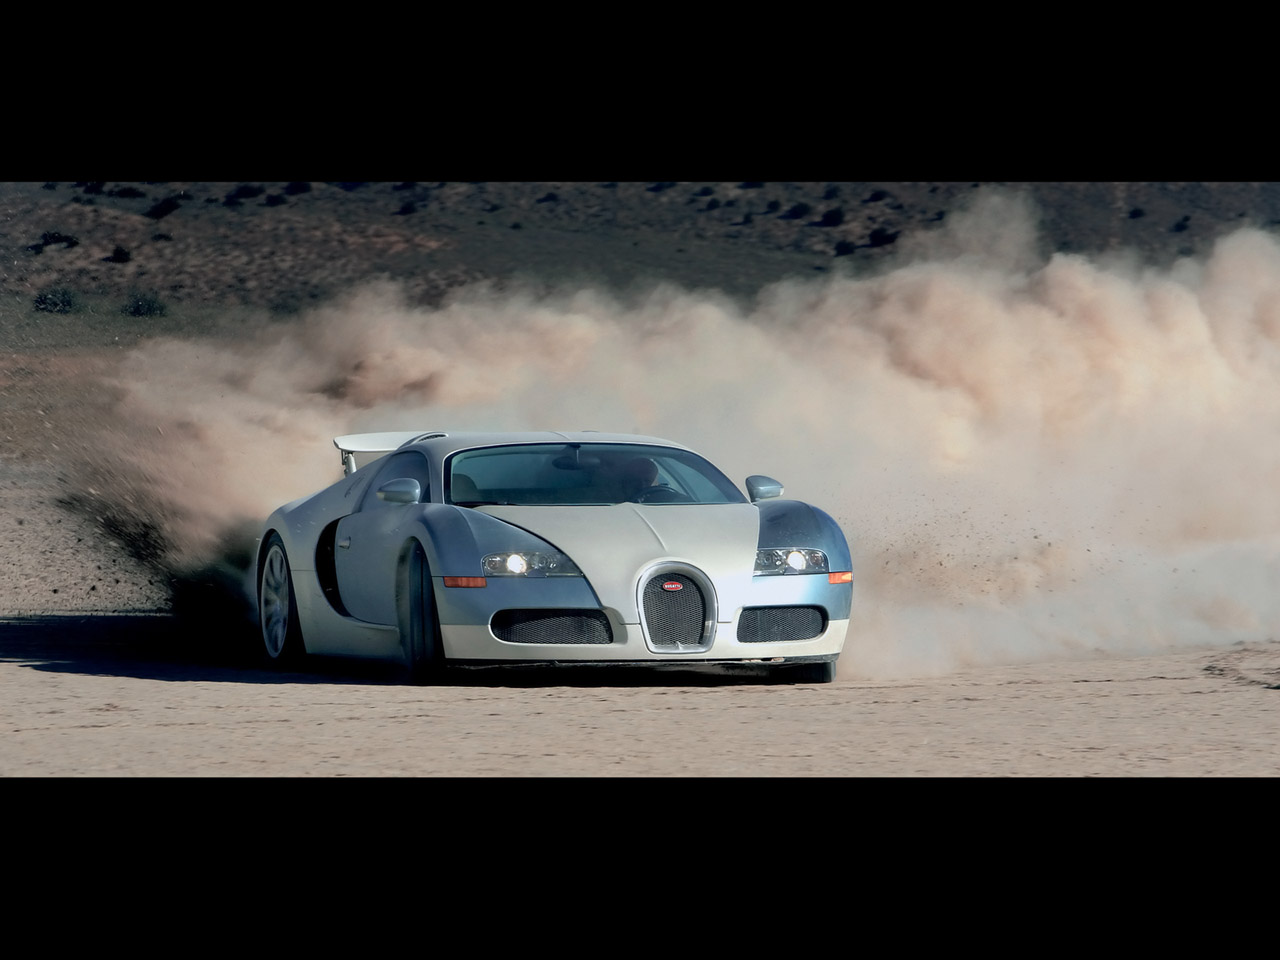 2006 Bugatti Veyron Targa Florio F Salt Flats 1280 960 Funny News